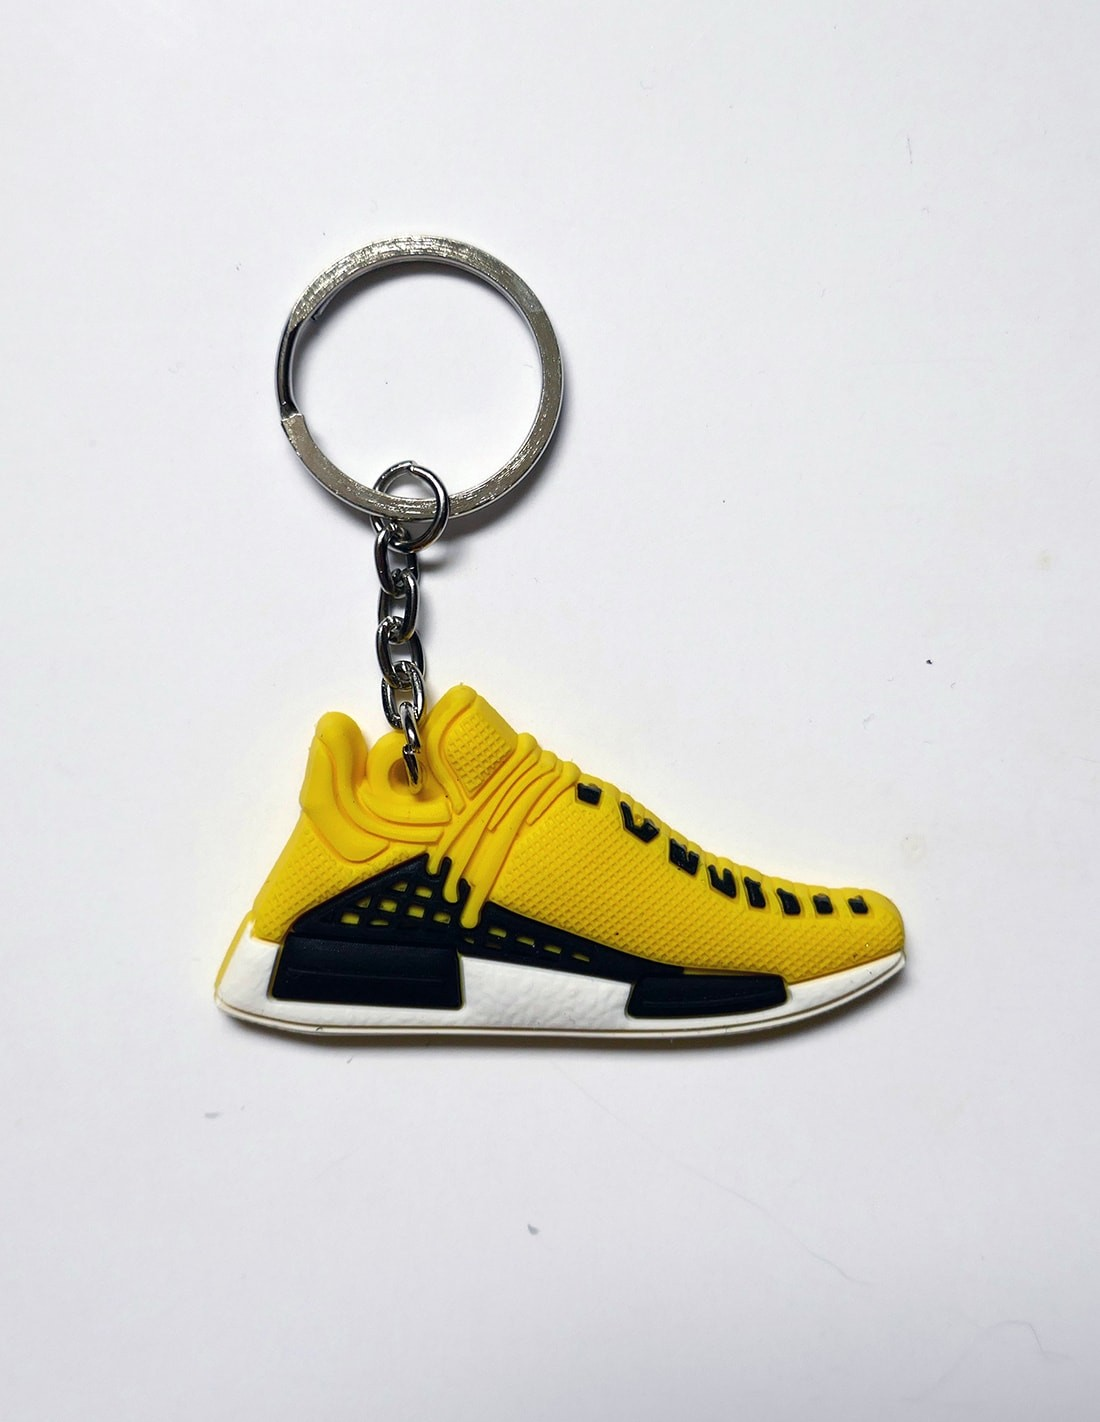 ff9a54b4c Porte clé Human race pw pharrell yellow par Adidas